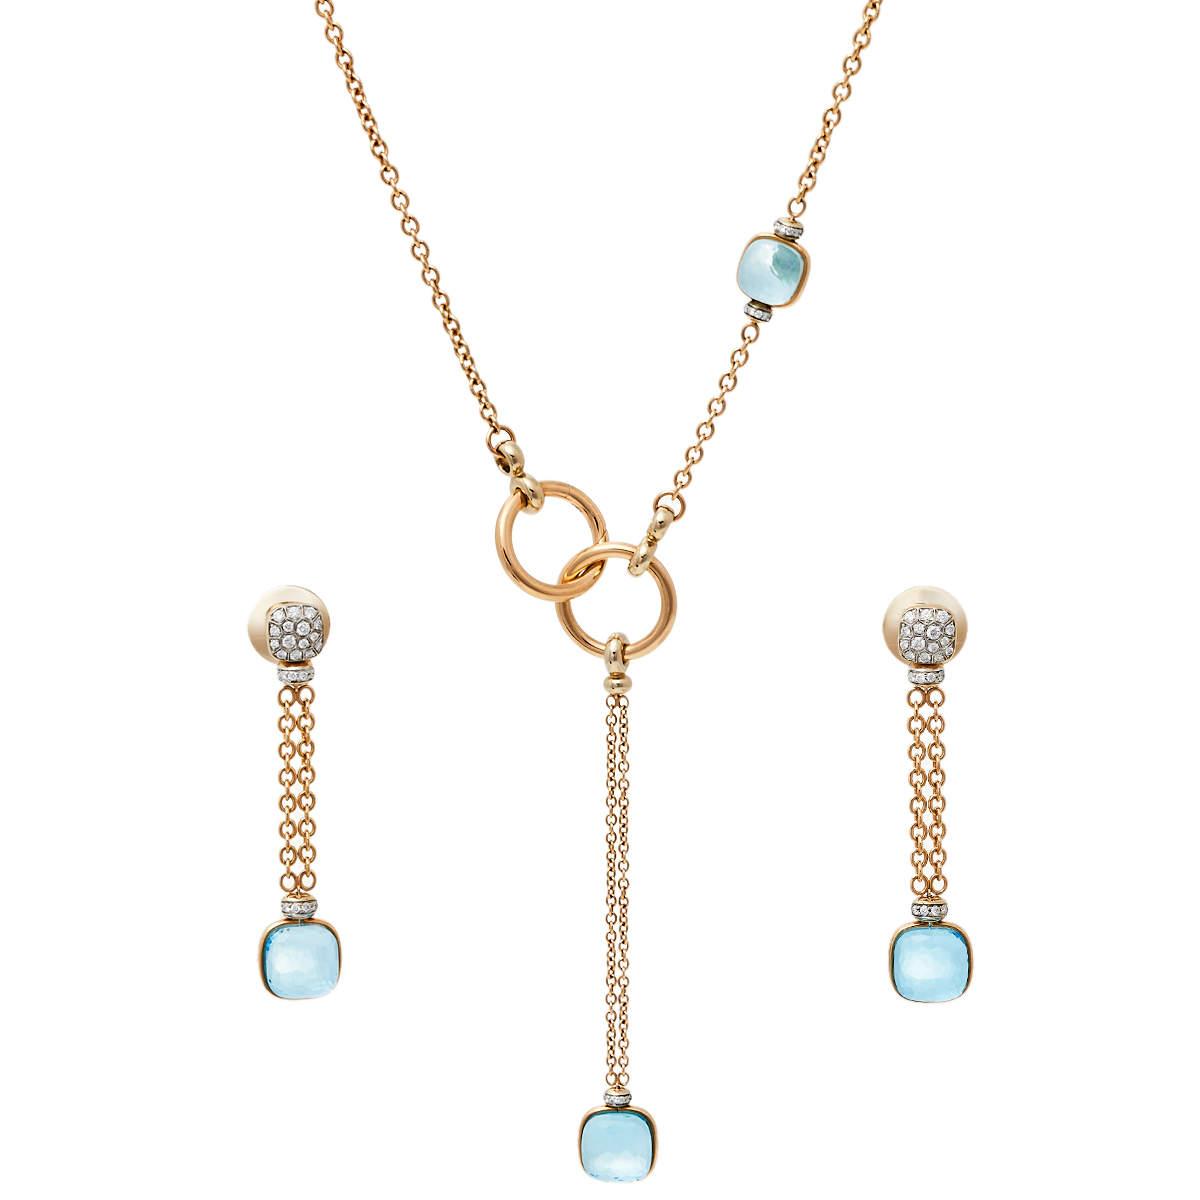 Pomellato Nudo Blue Topaz Diamond 18K Rose Gold Sautoir Necklace and Long Earrings Set